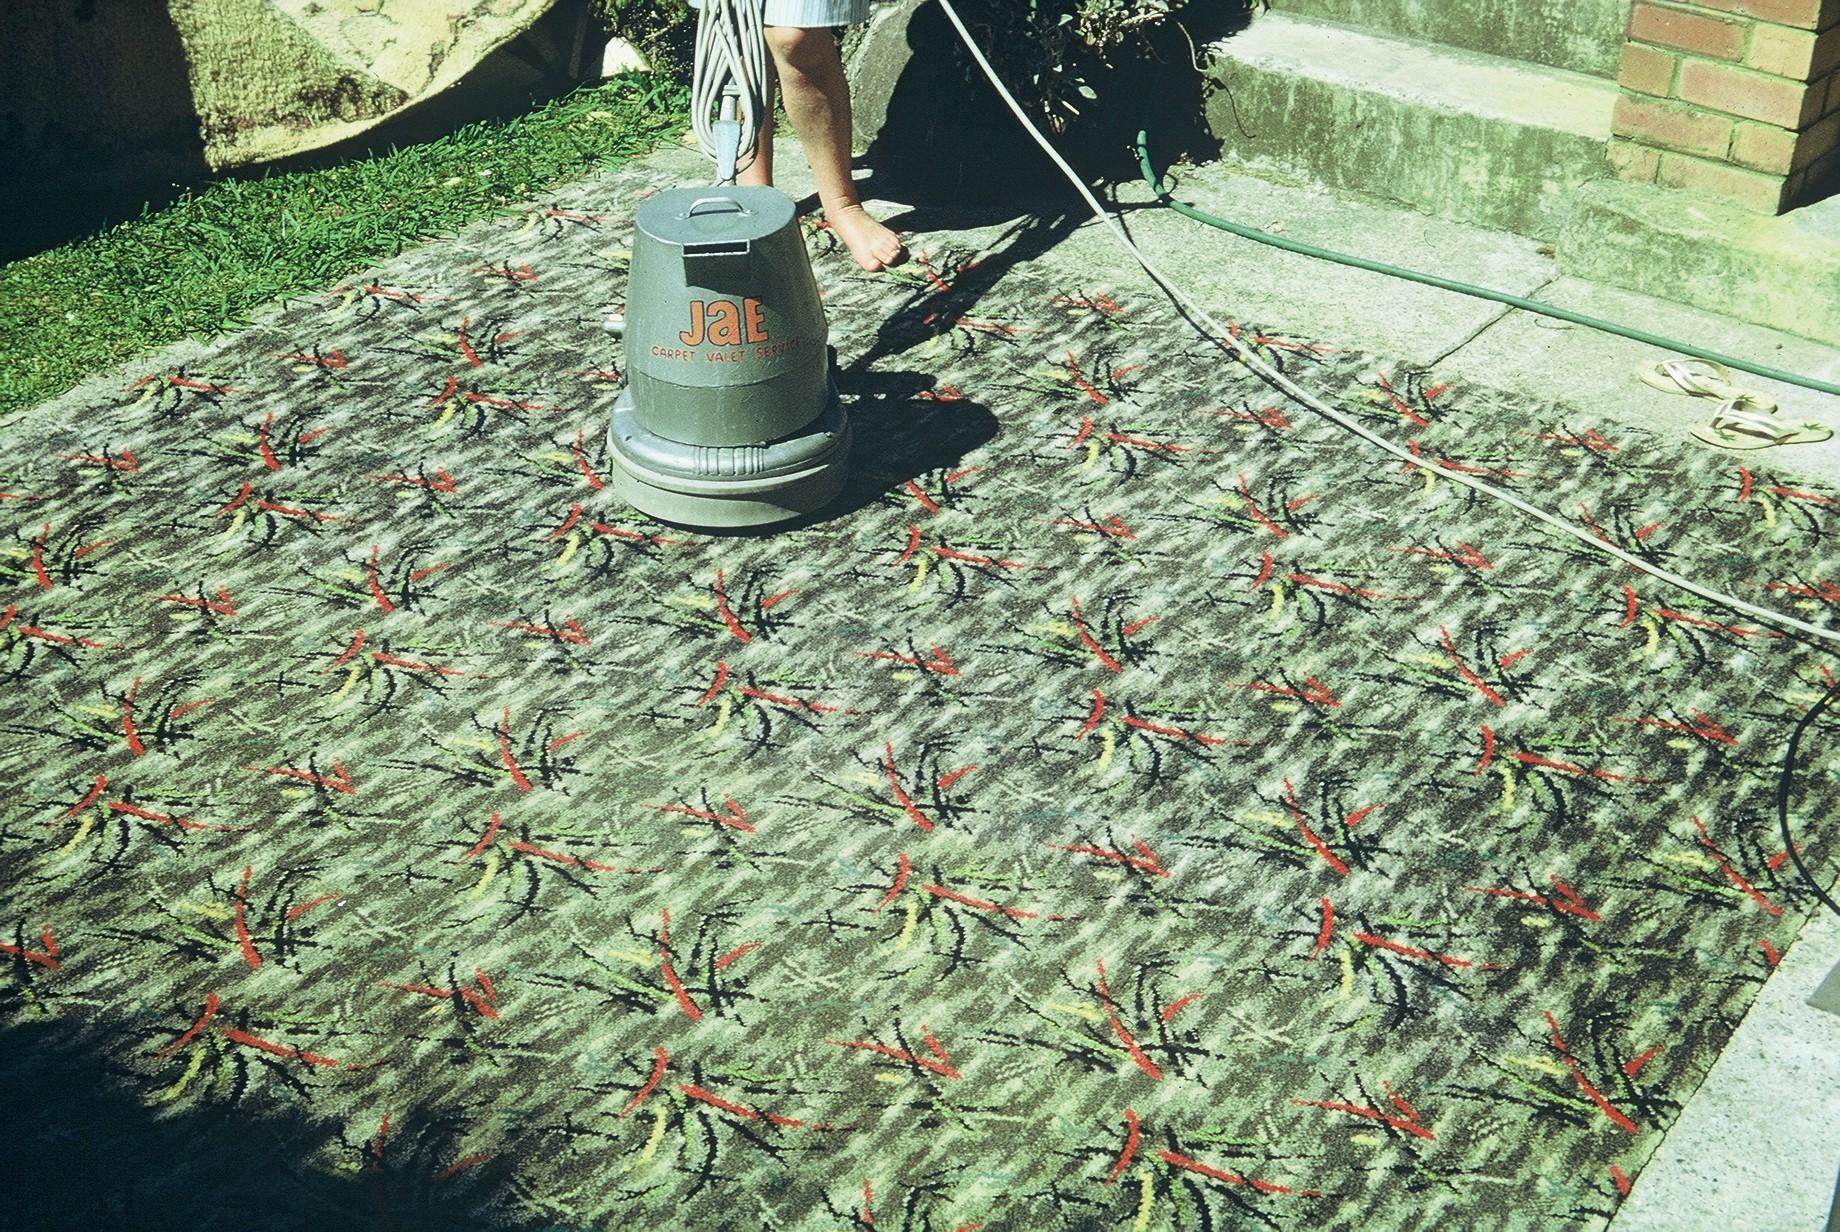 jae-carpet-cleaning